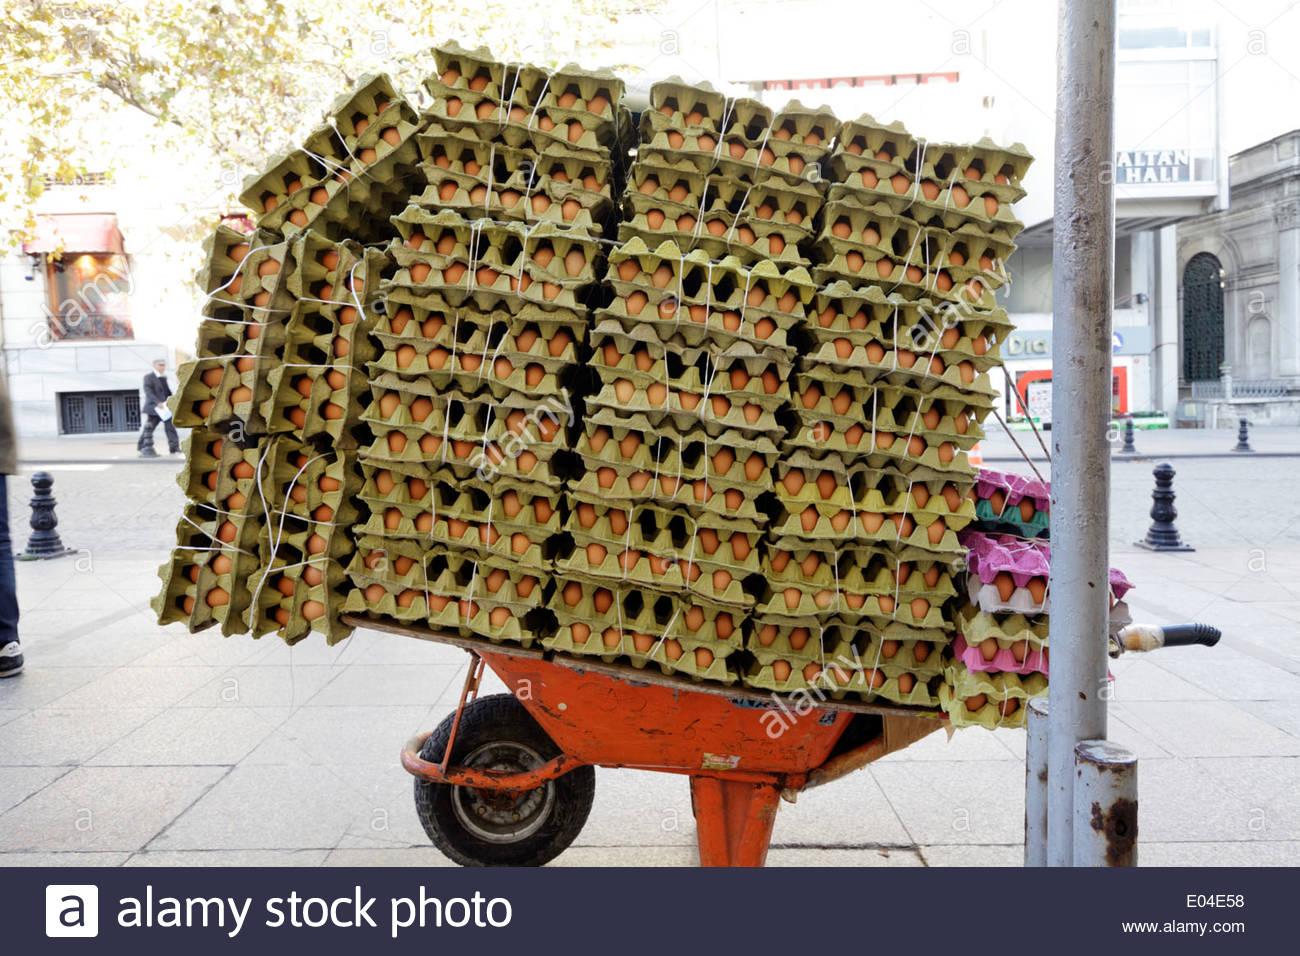 wheelbarrow loaded with eggs - Stock Image